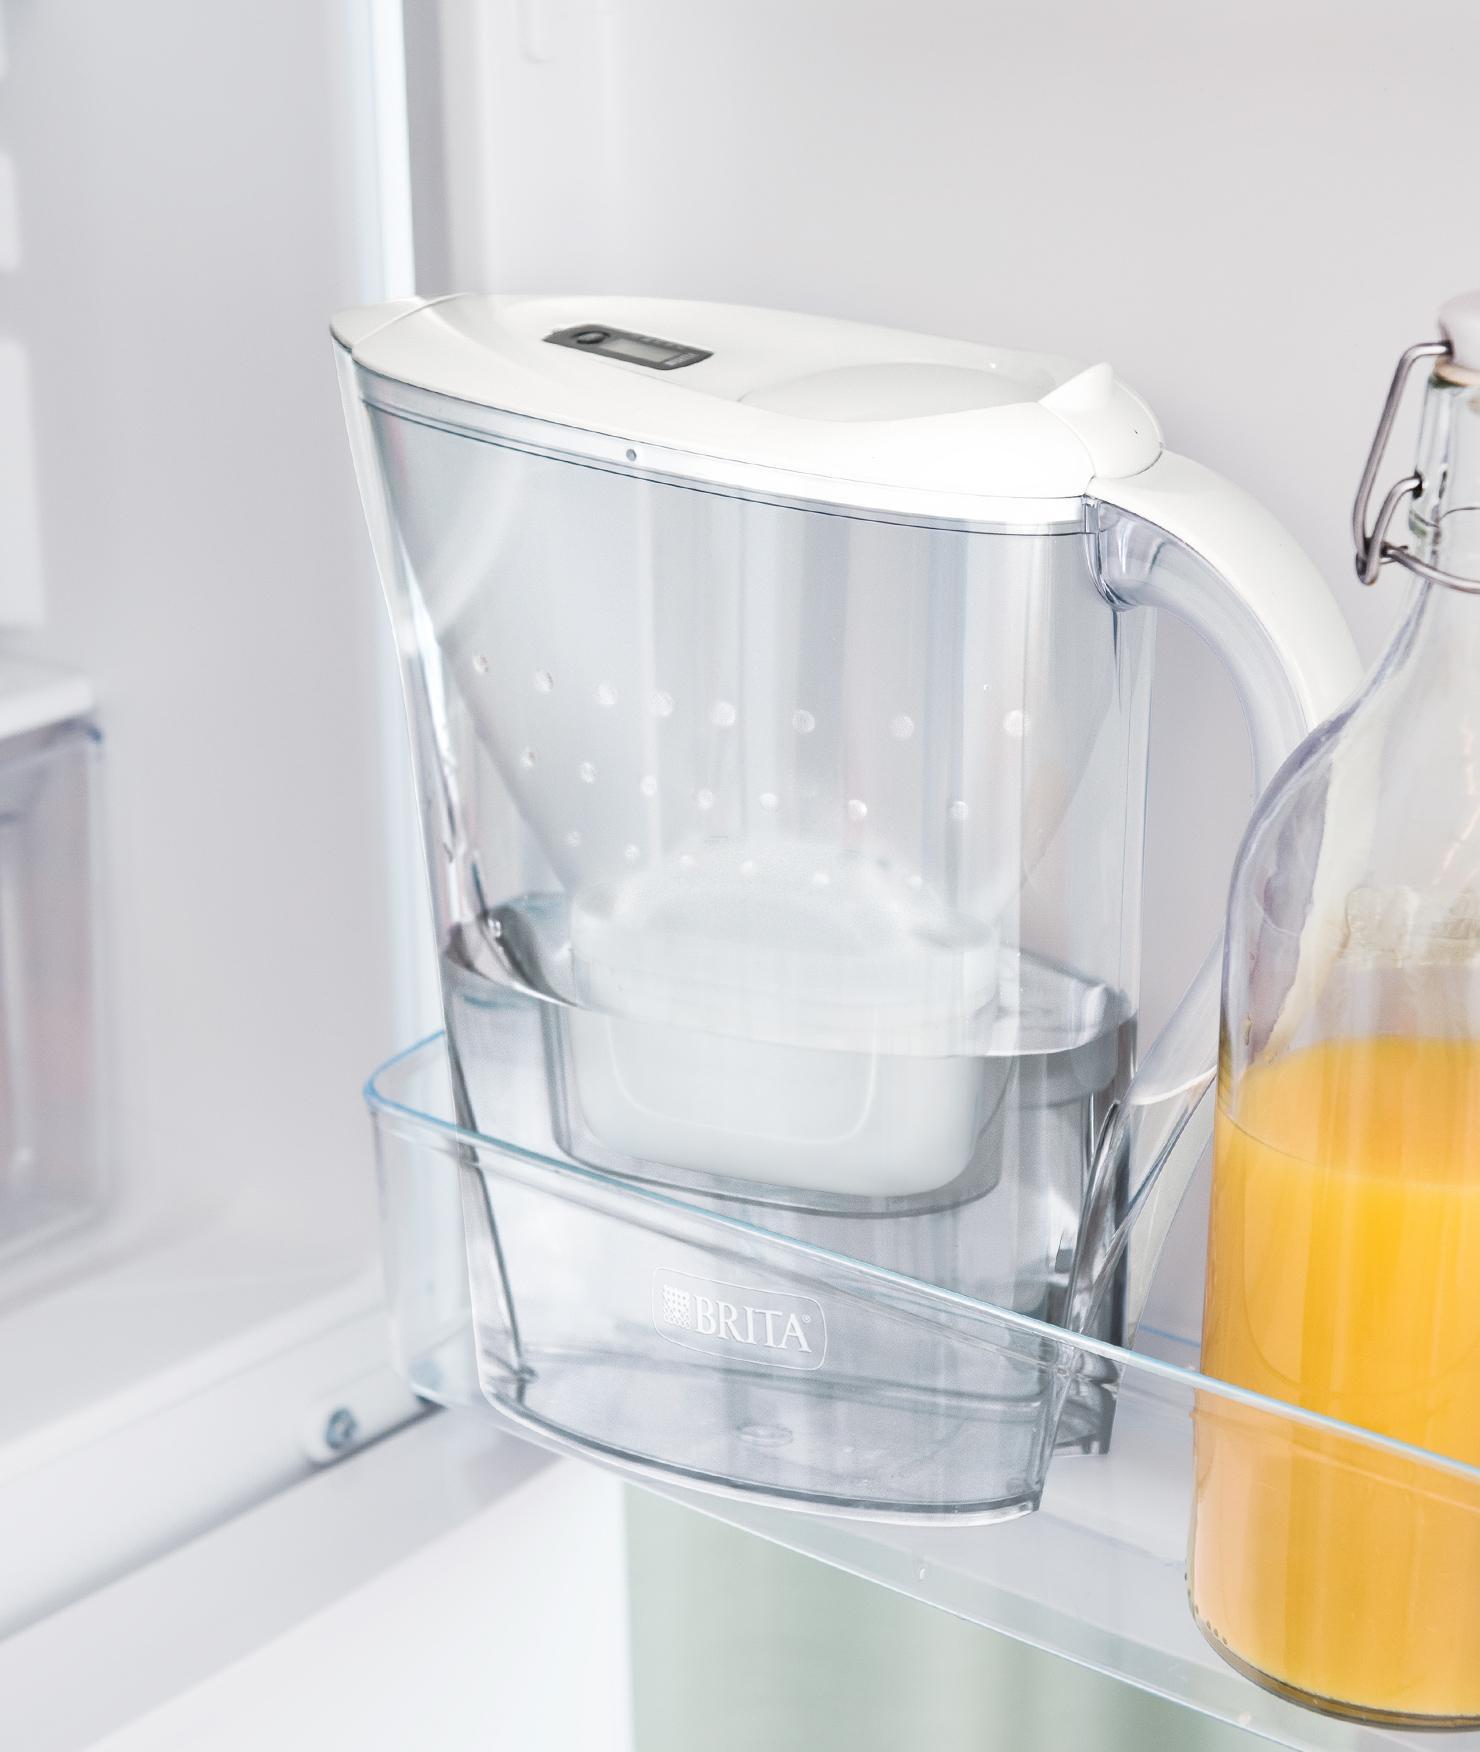 BRITA fill&enjoy Marella Cool white réfrigérateur